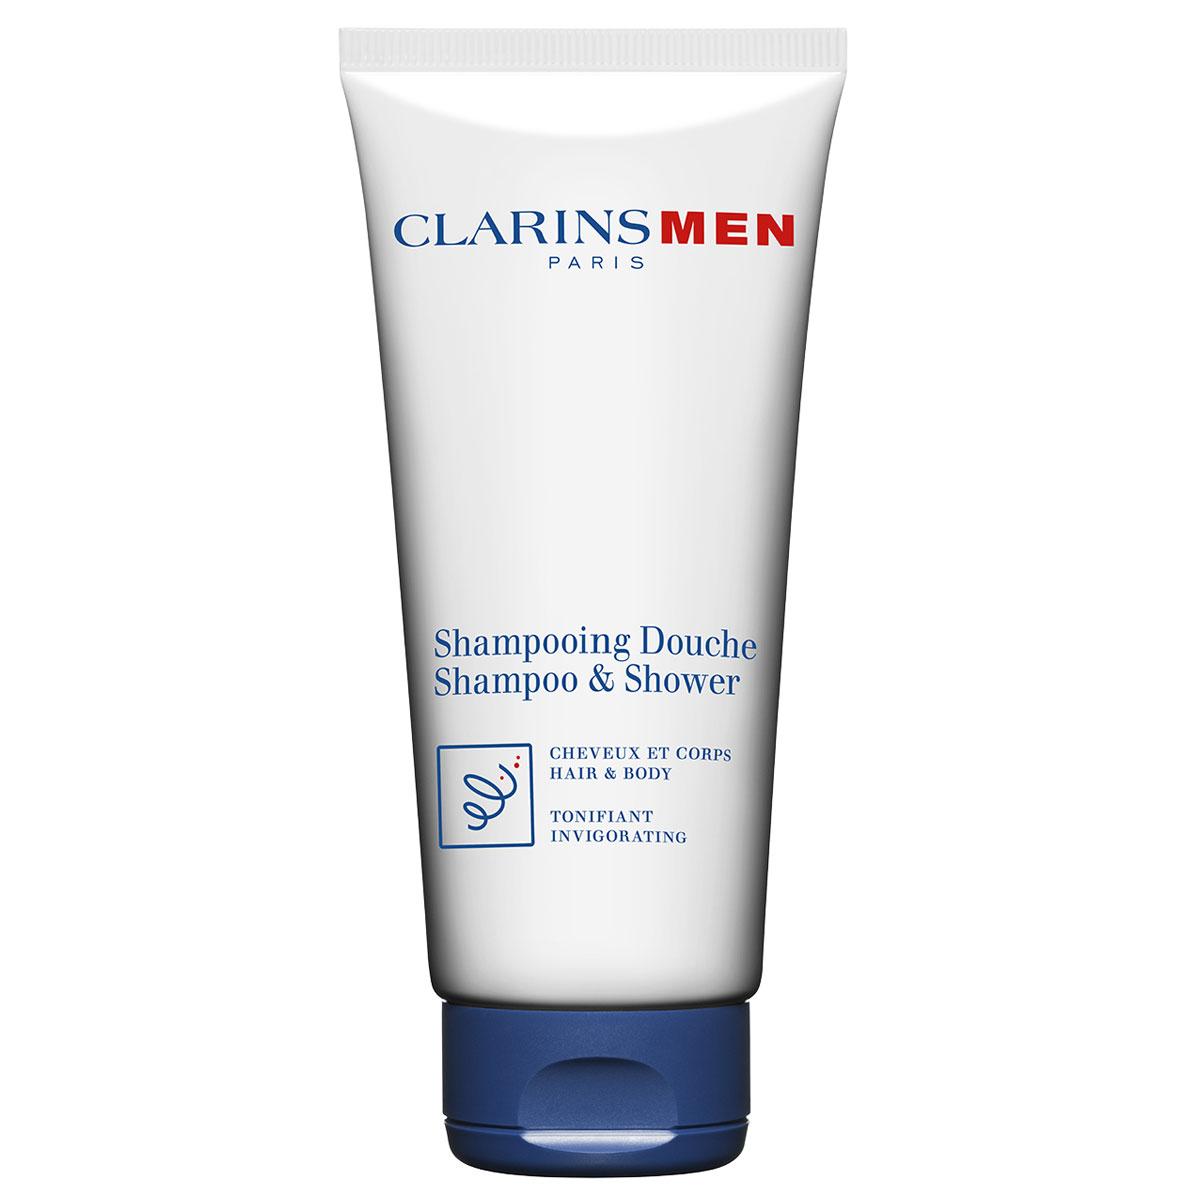 ClarinsMen - Shampooing Douche - 200 ml